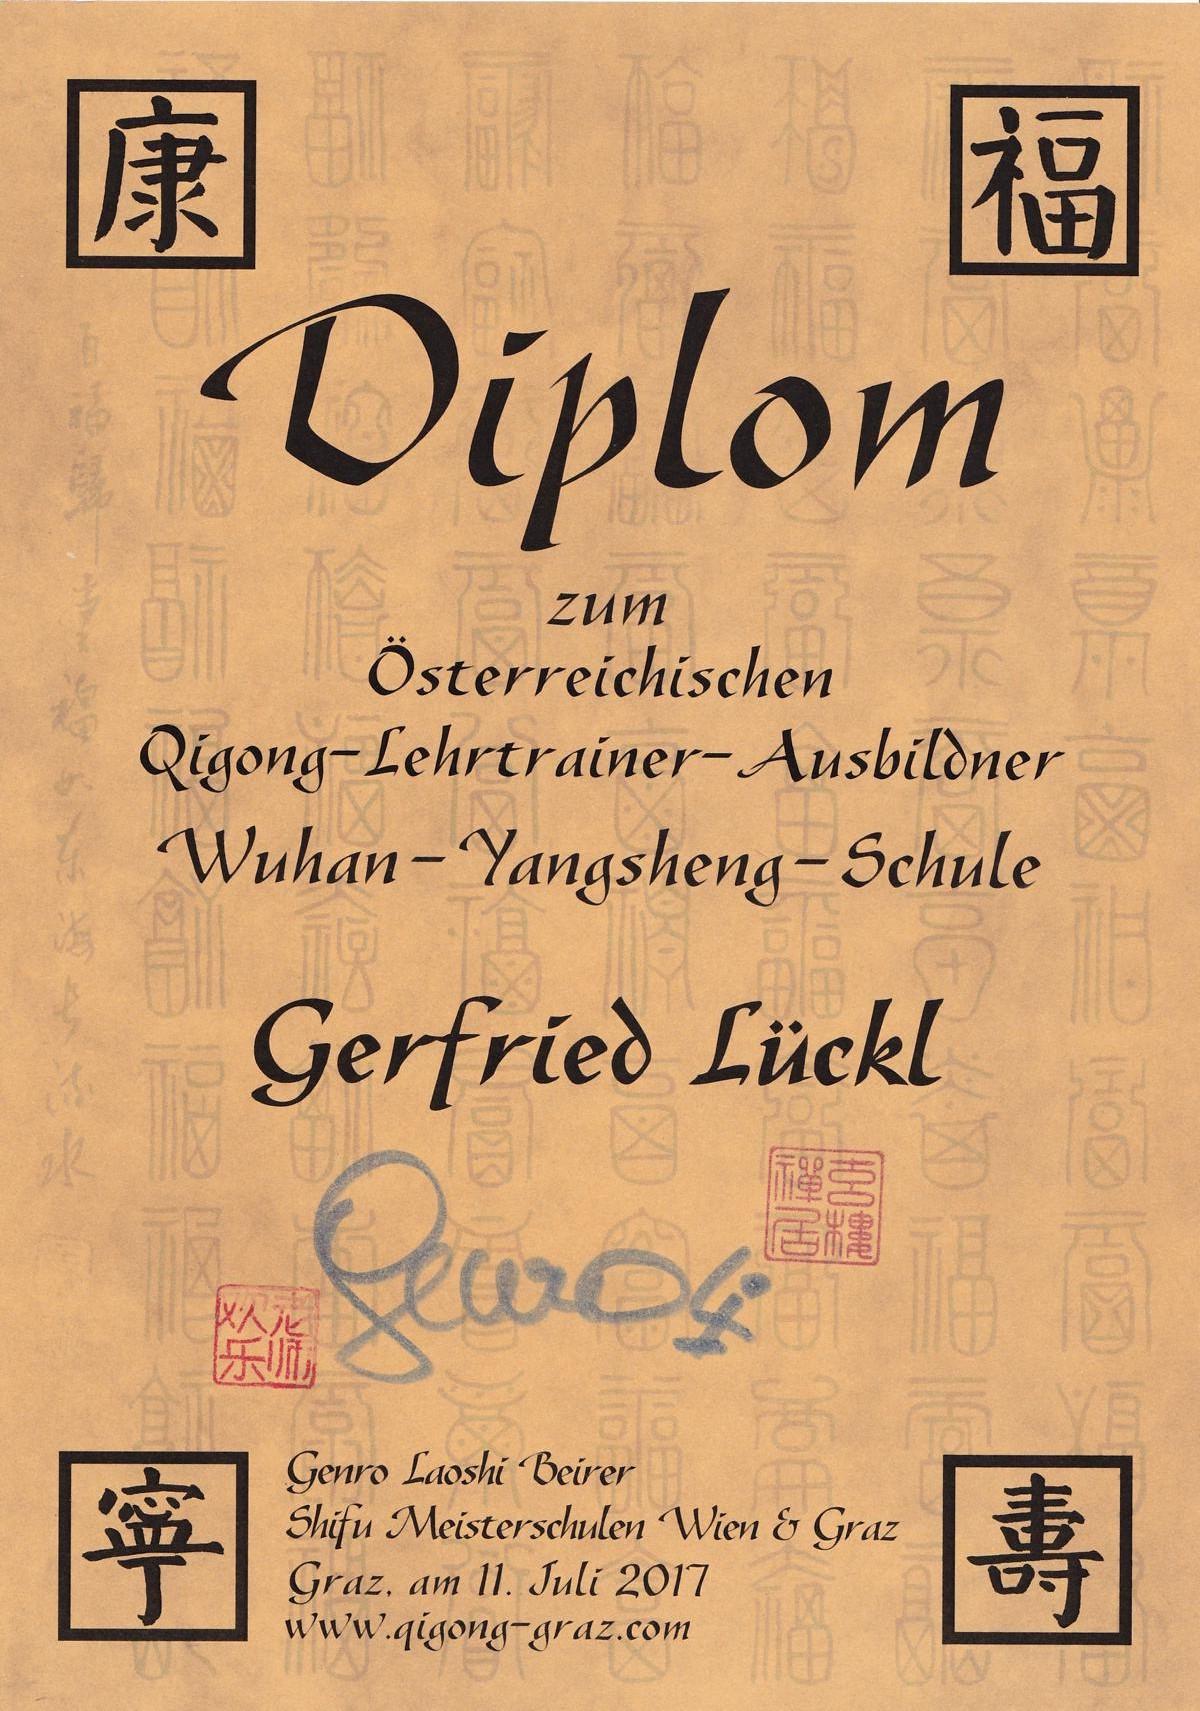 Gerfried Lückl Qi Gong Zeugnis Meditation